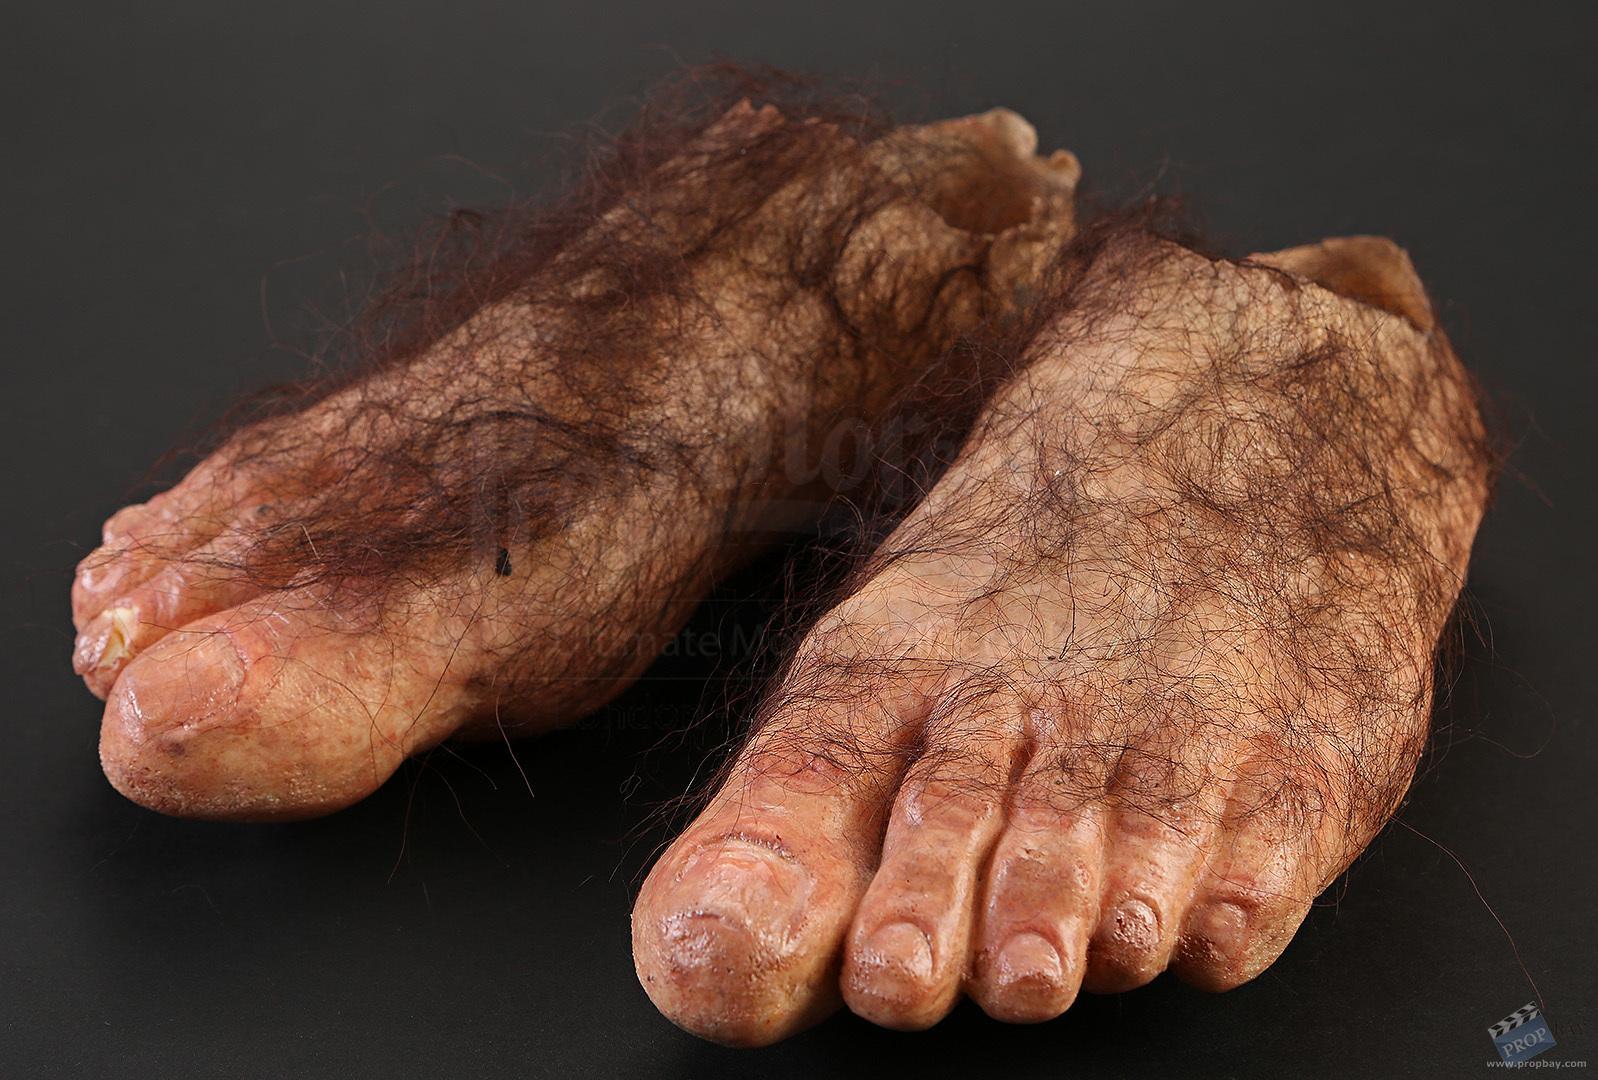 The Hobbit Feet Appliances Wardrobe From The Hobbit An